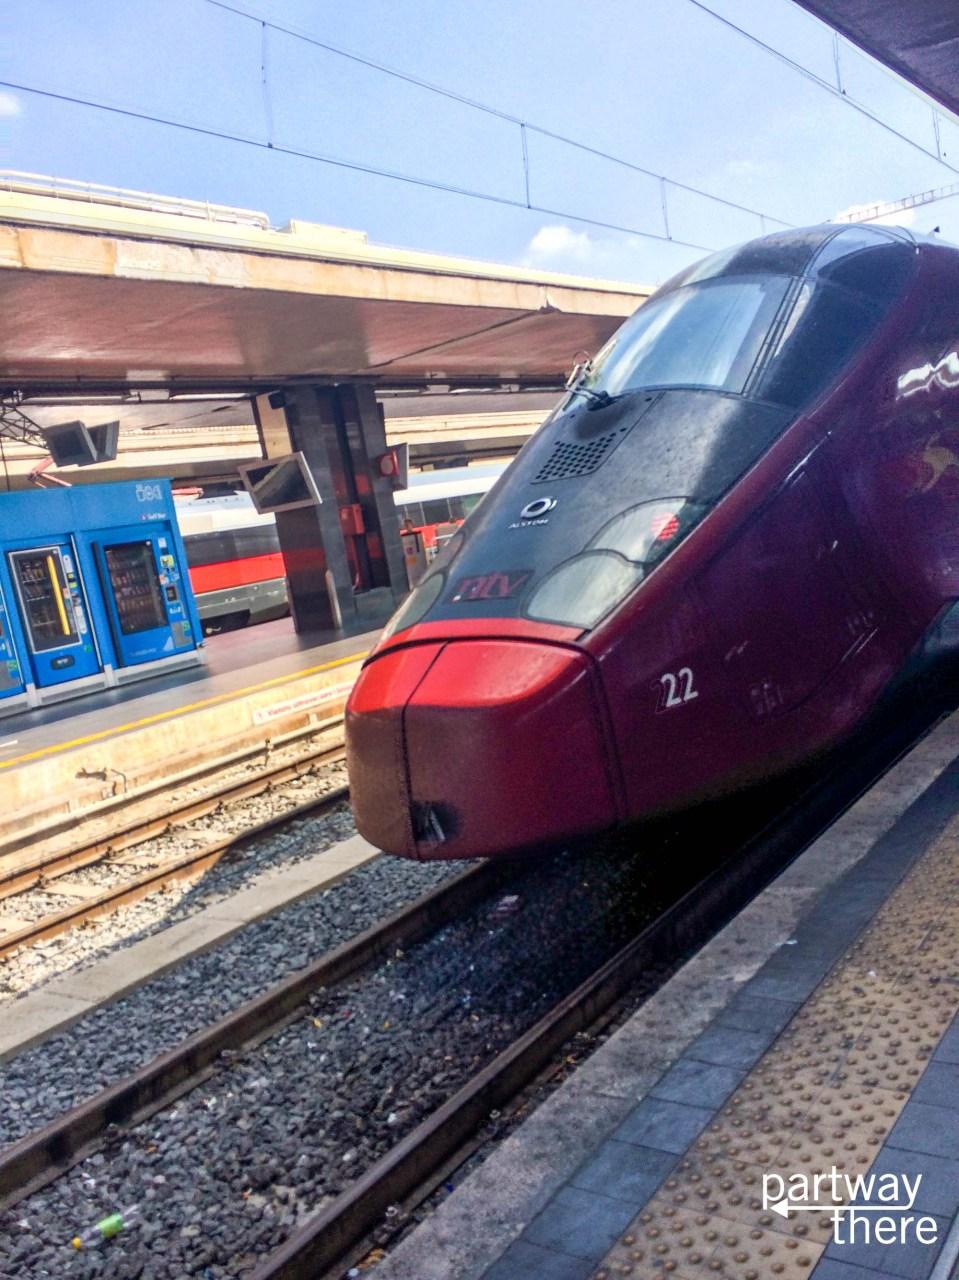 The treno train in Italy